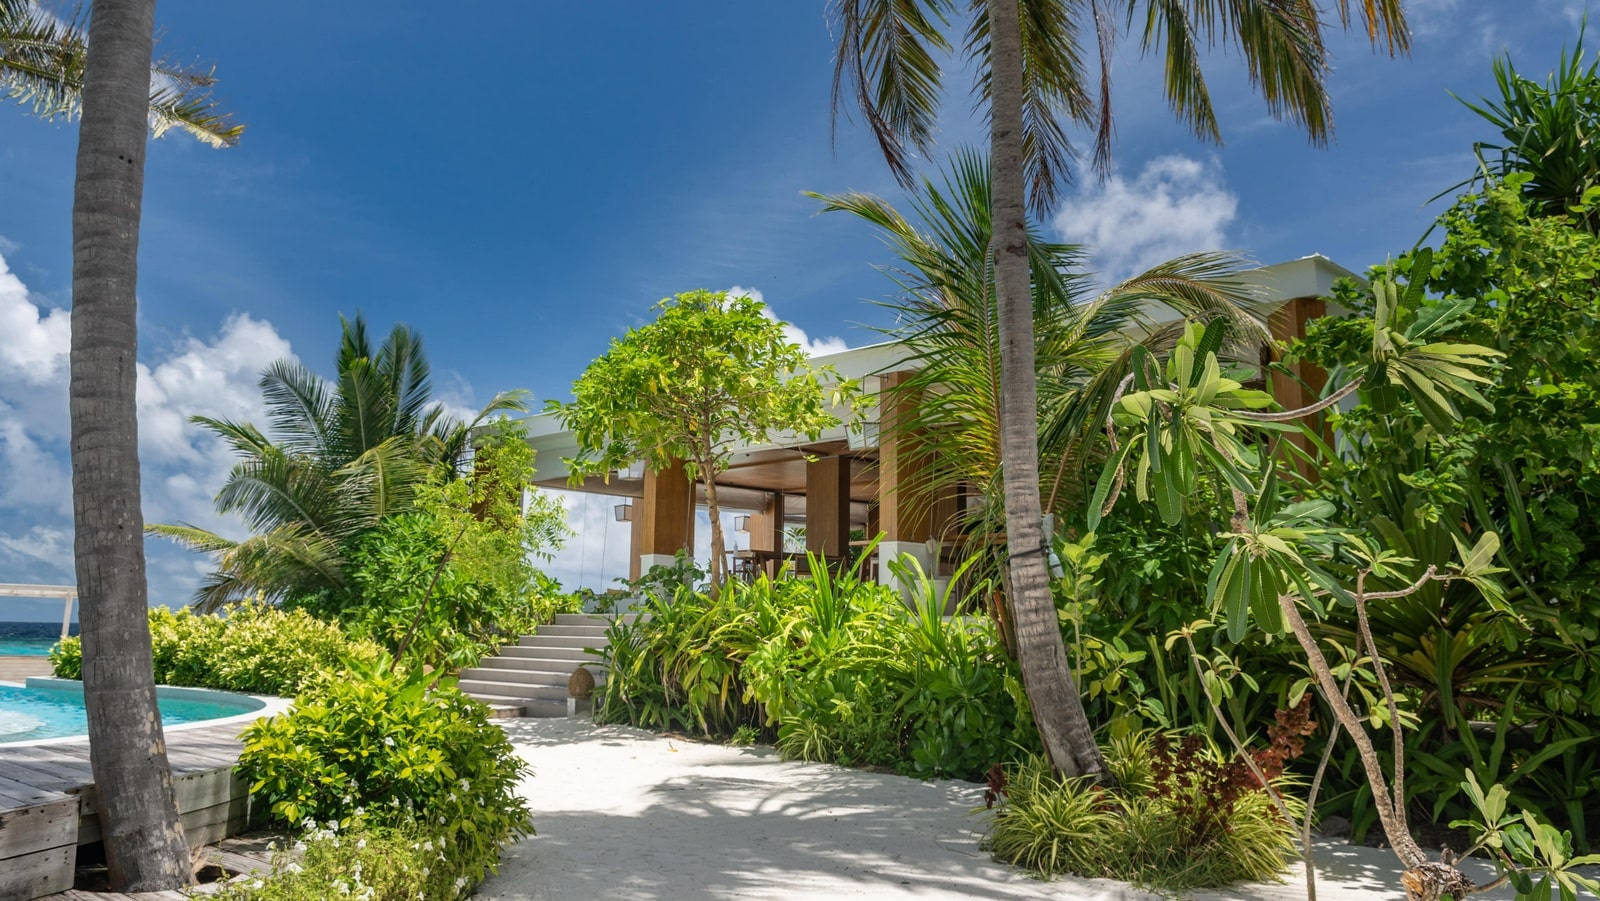 Мальдивы, отель Amilla Fushi Maldives, бар Baa Baa